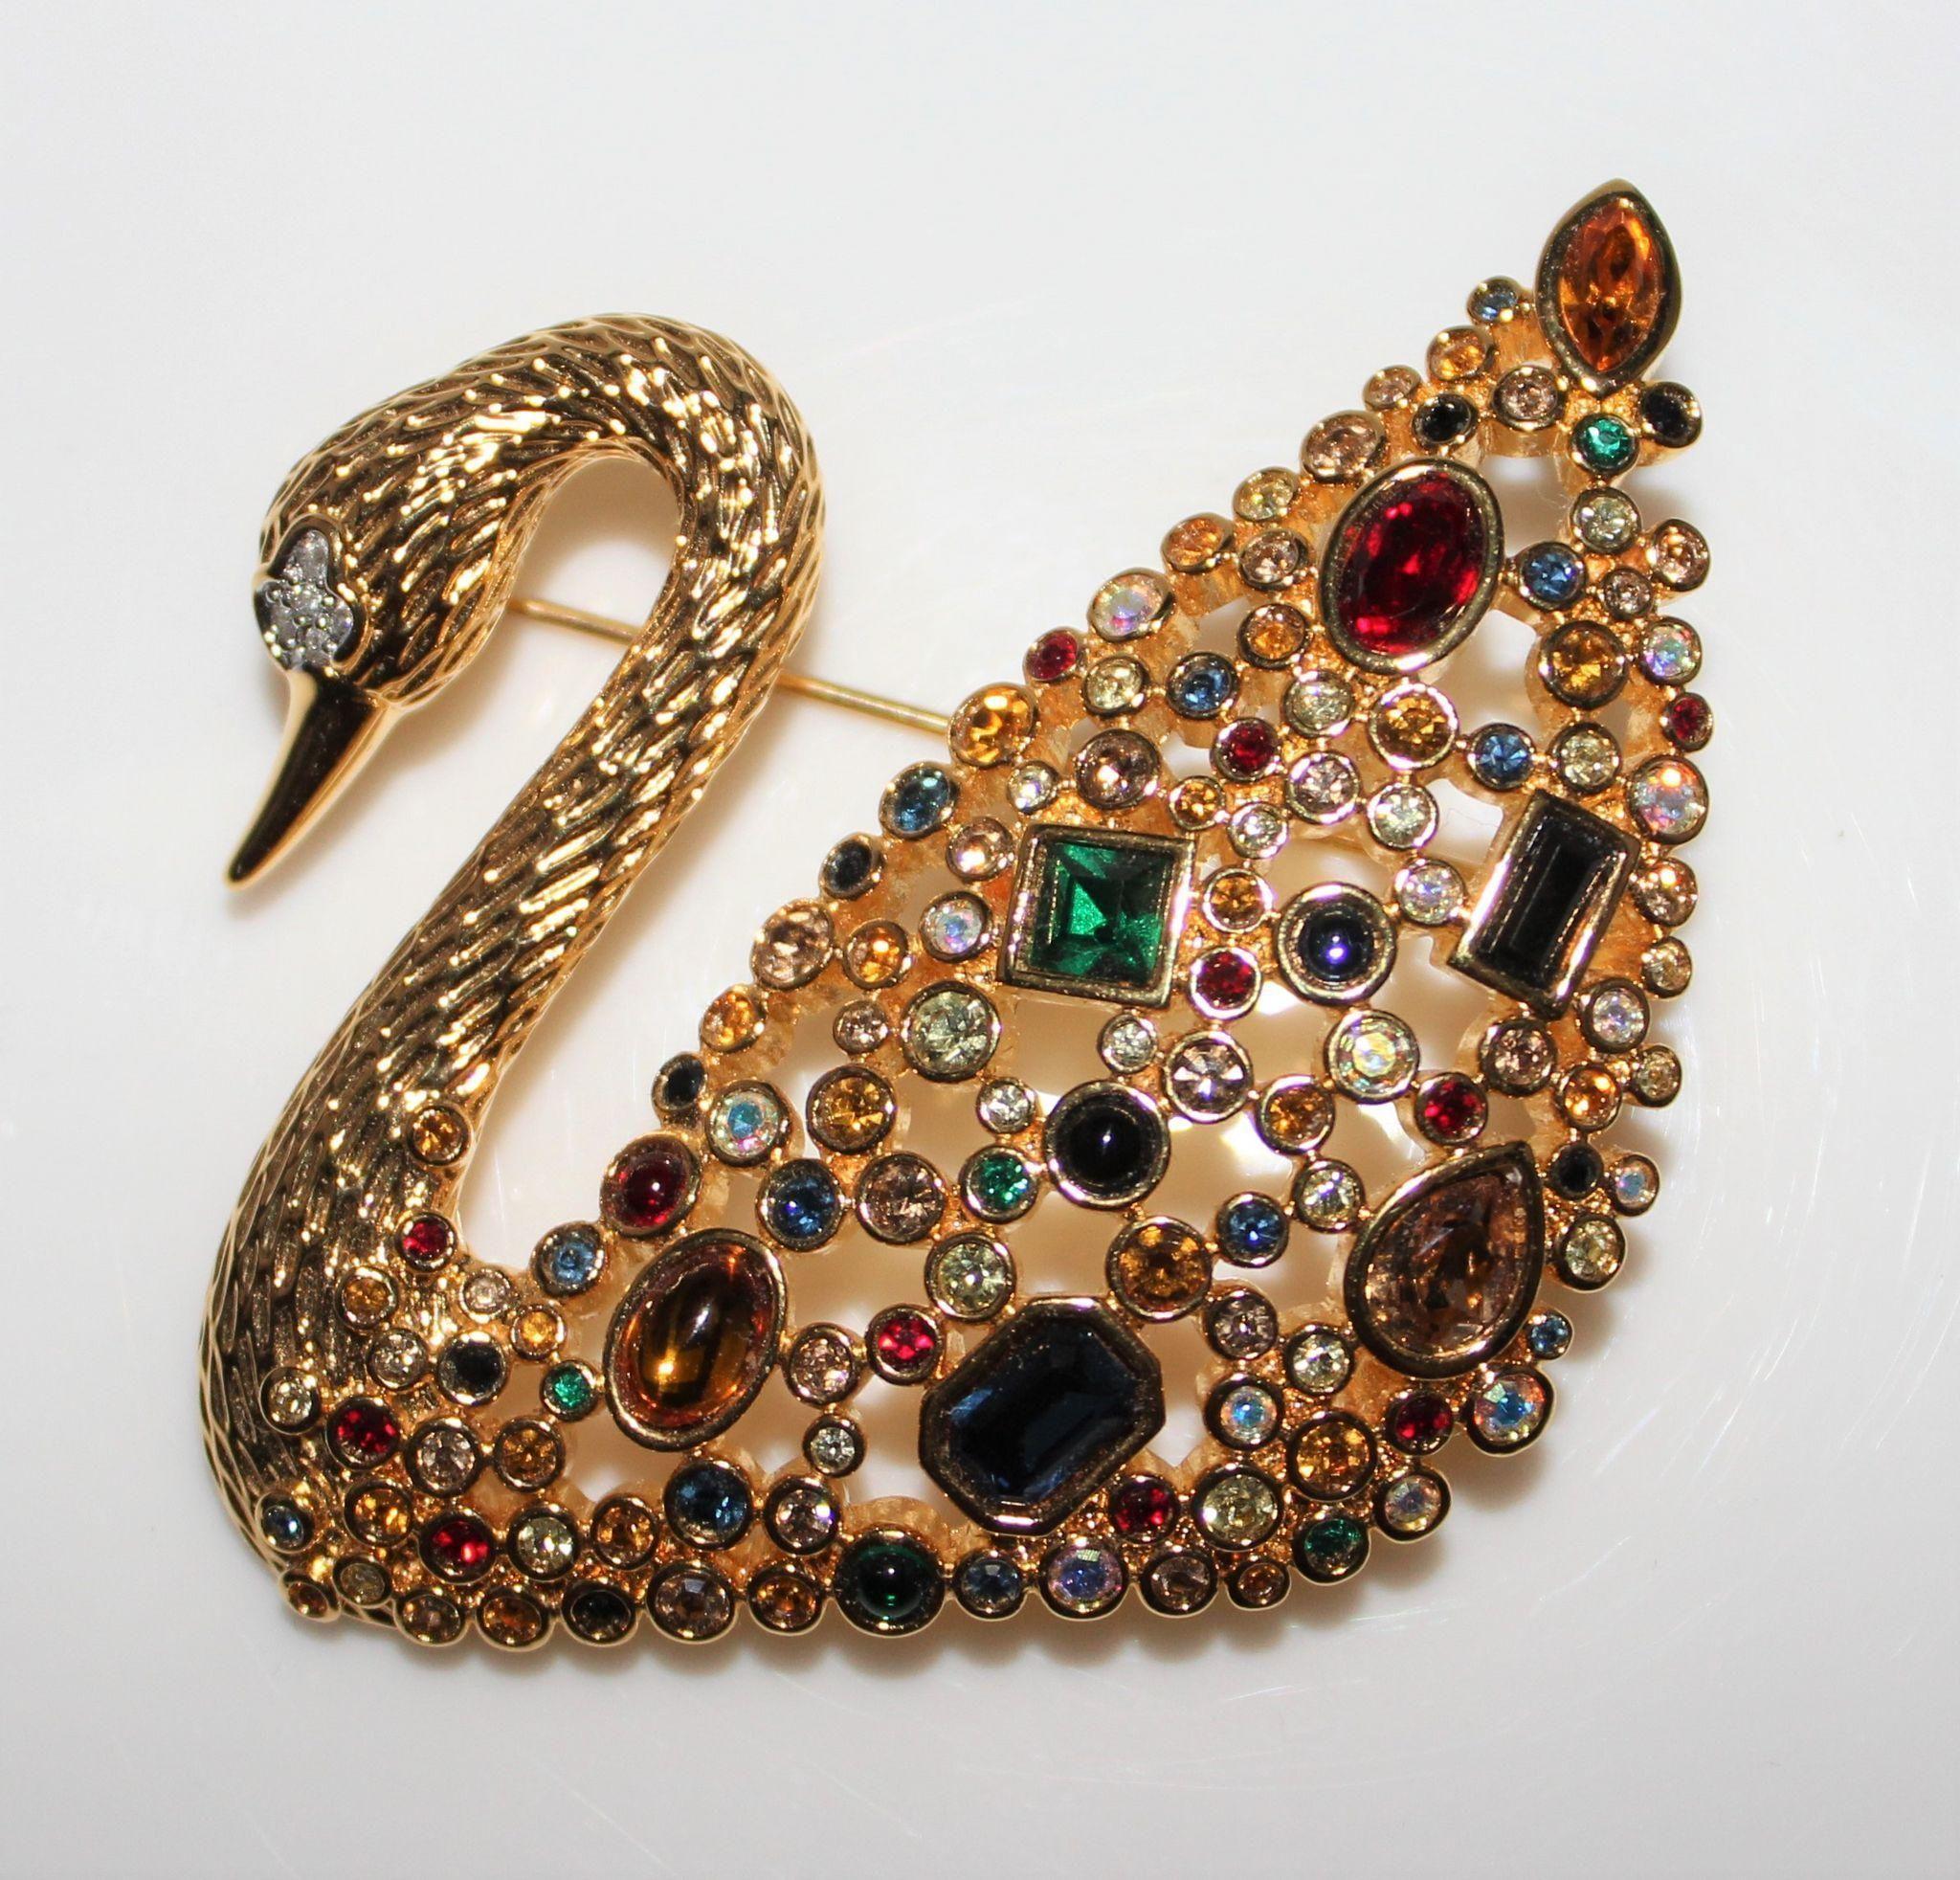 dc02a2227317e Signed Swarovski Swan Multi Color Crystal Brooch - In Box, 1995 ...